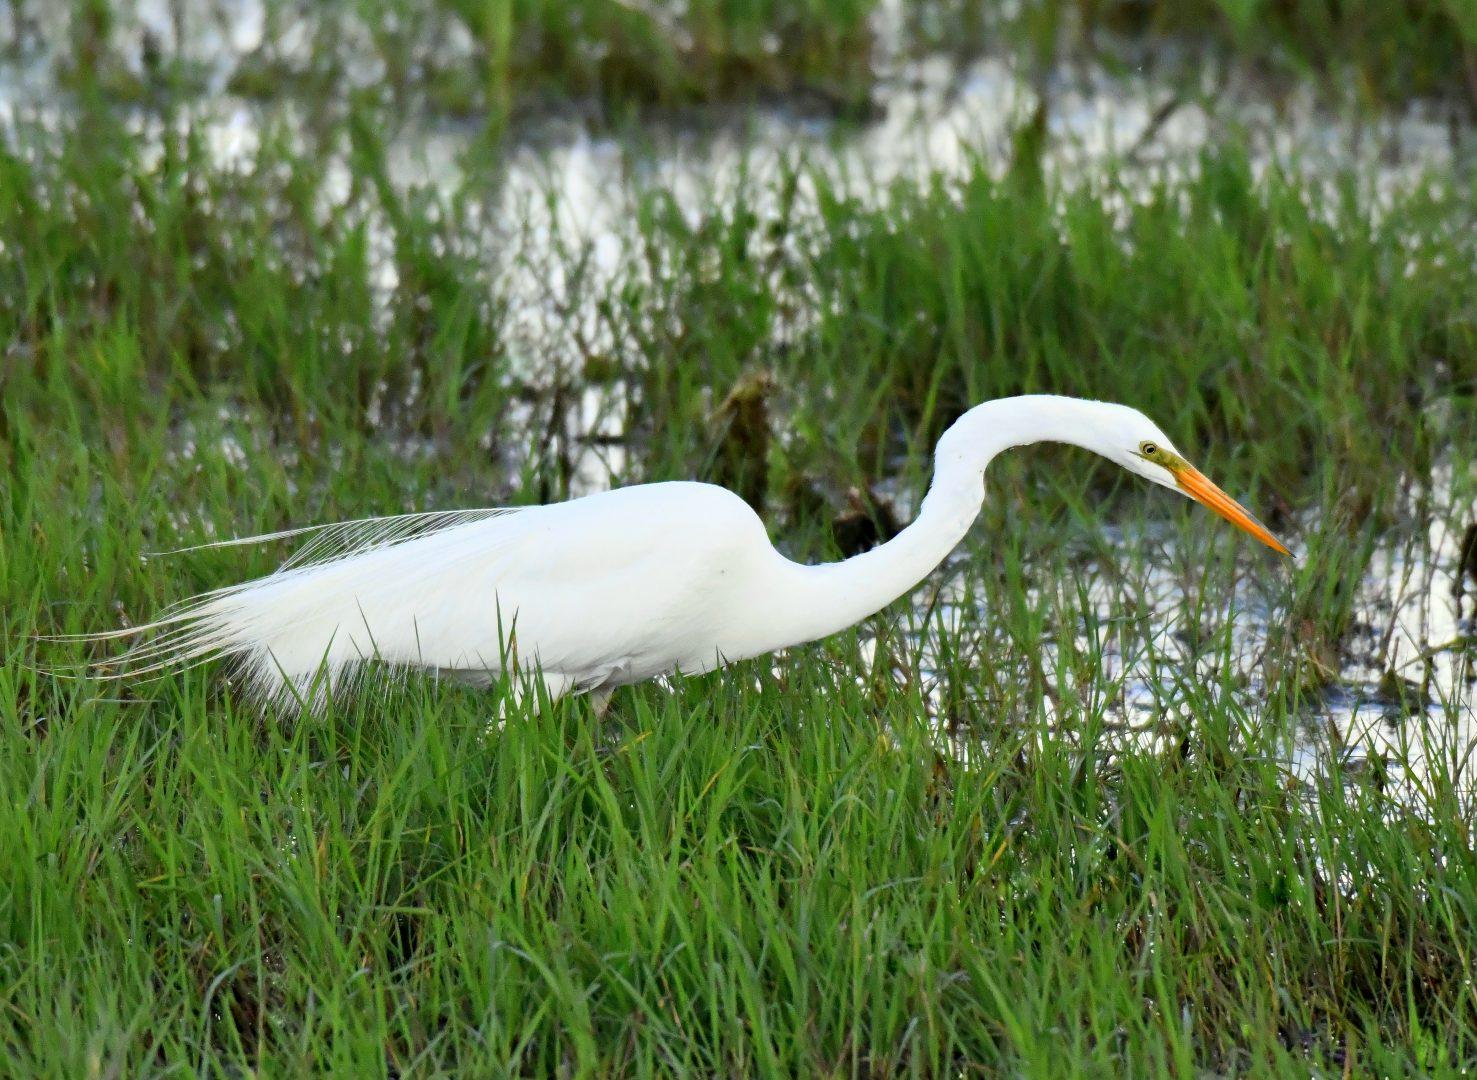 Great Egret | Bosque del Apacne | May, 2019